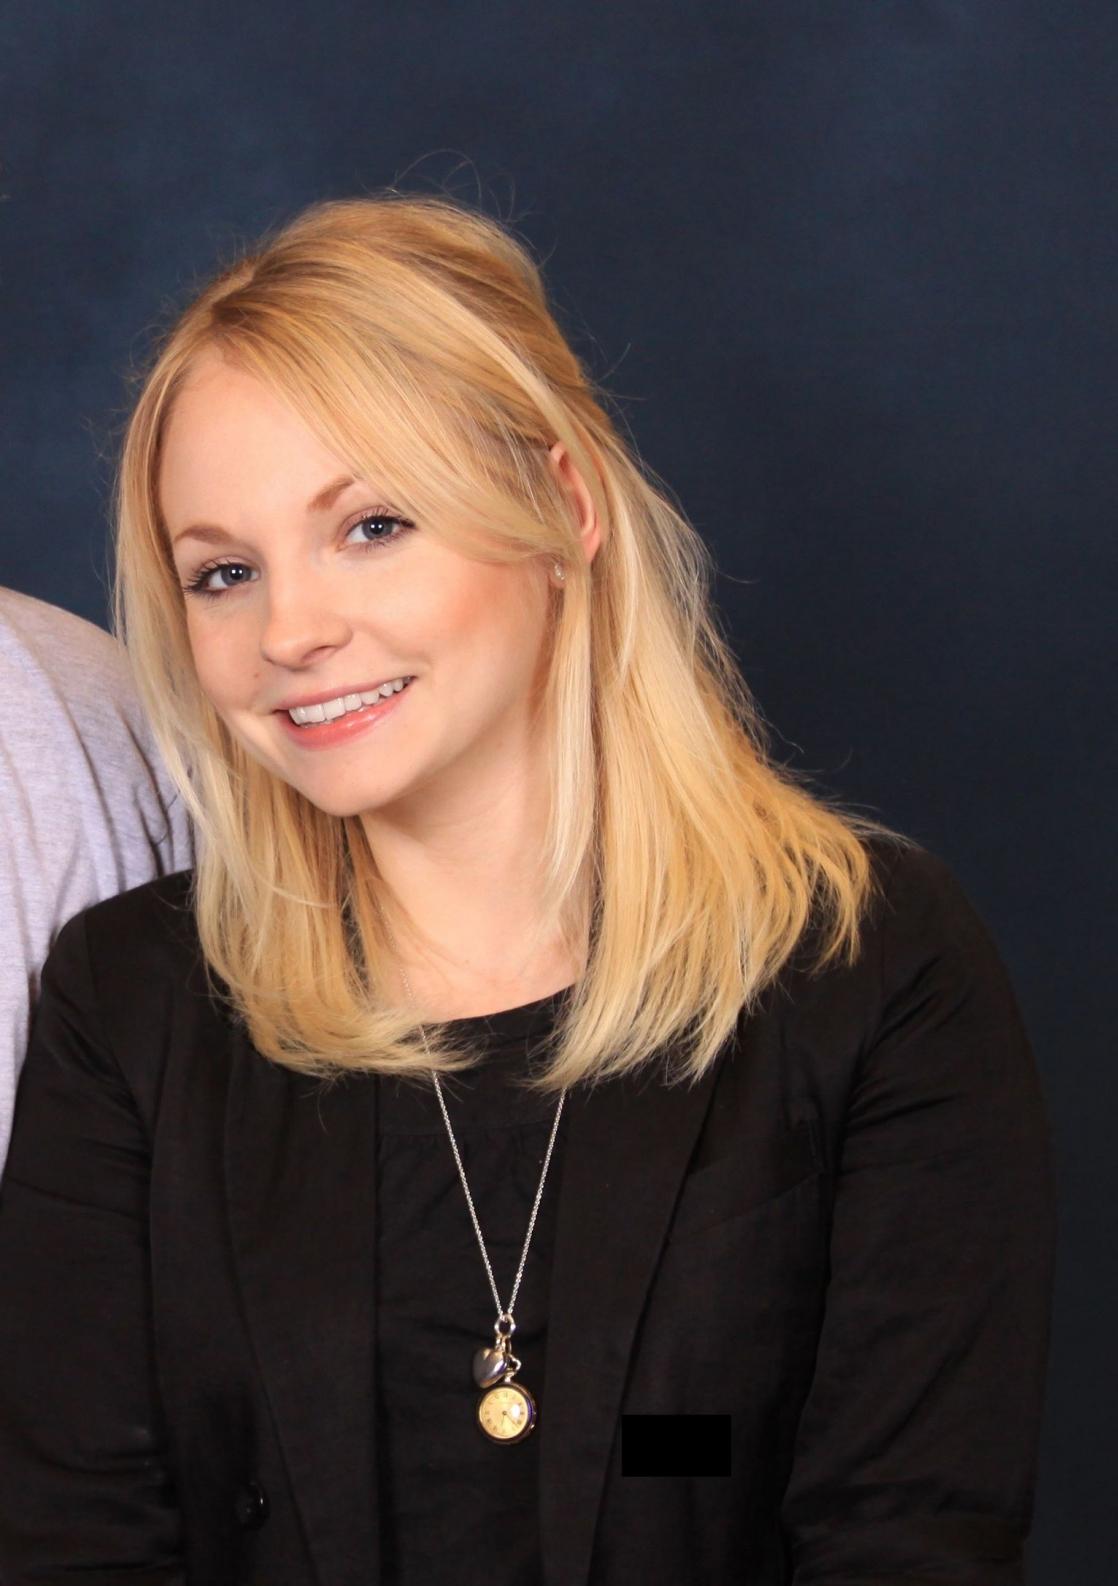 Georgia Moffett (born 1984)